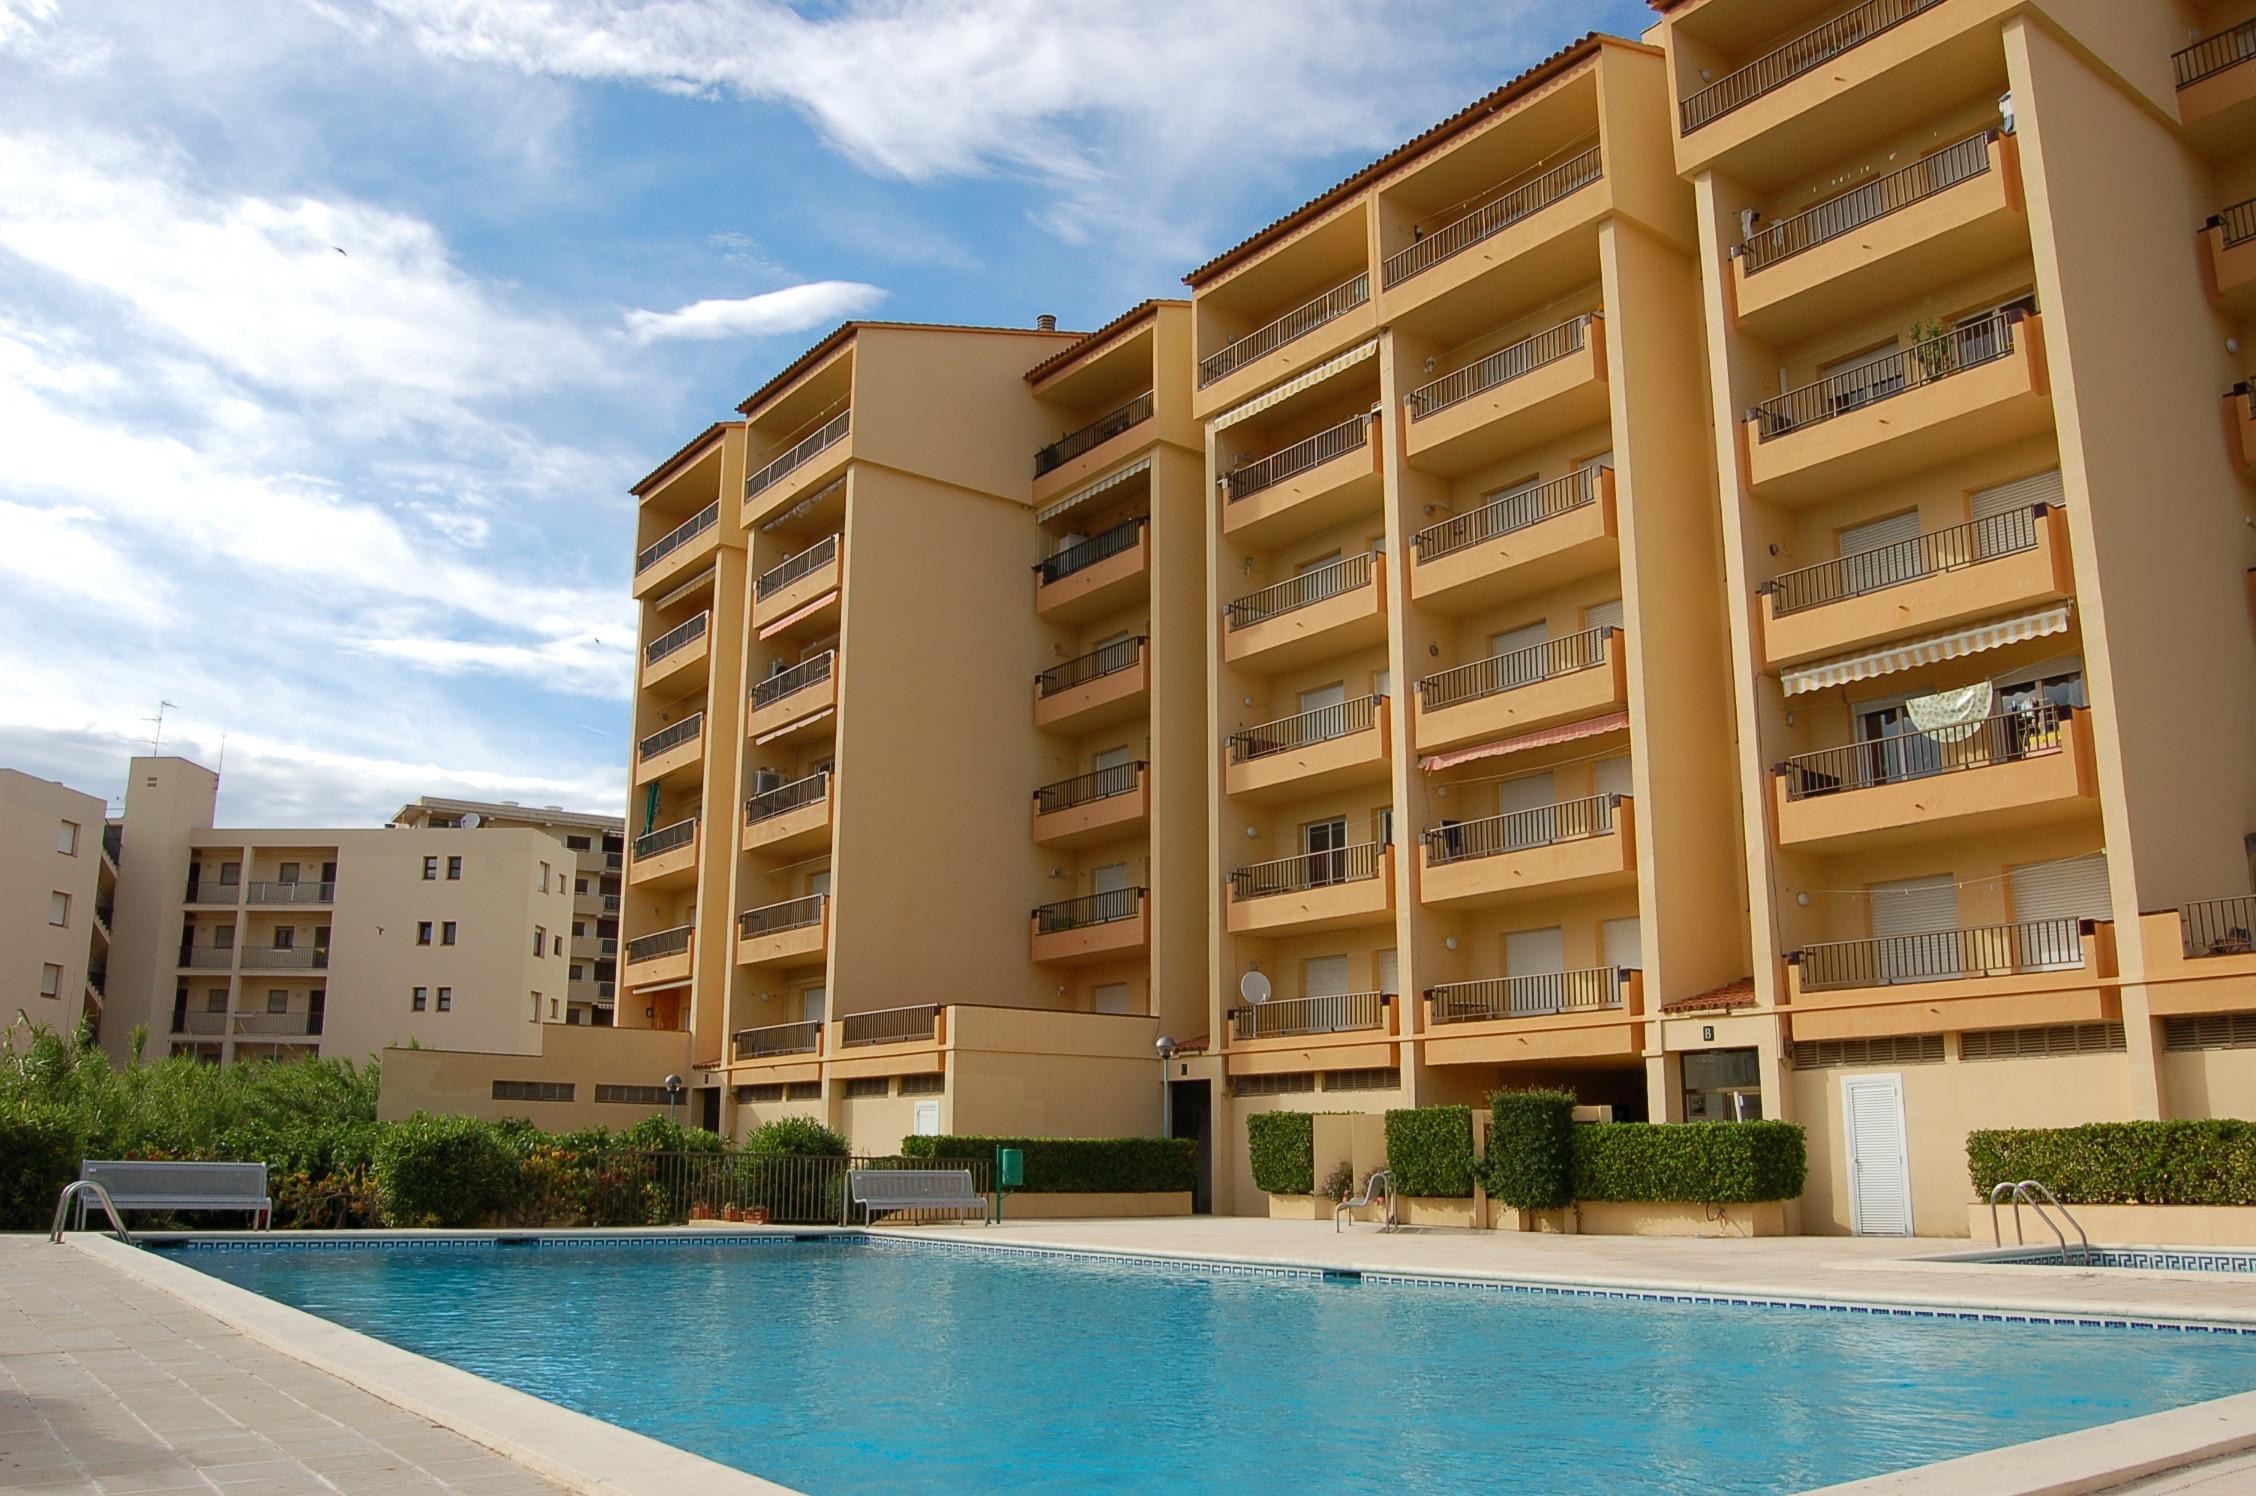 Appartements avec piscine com.